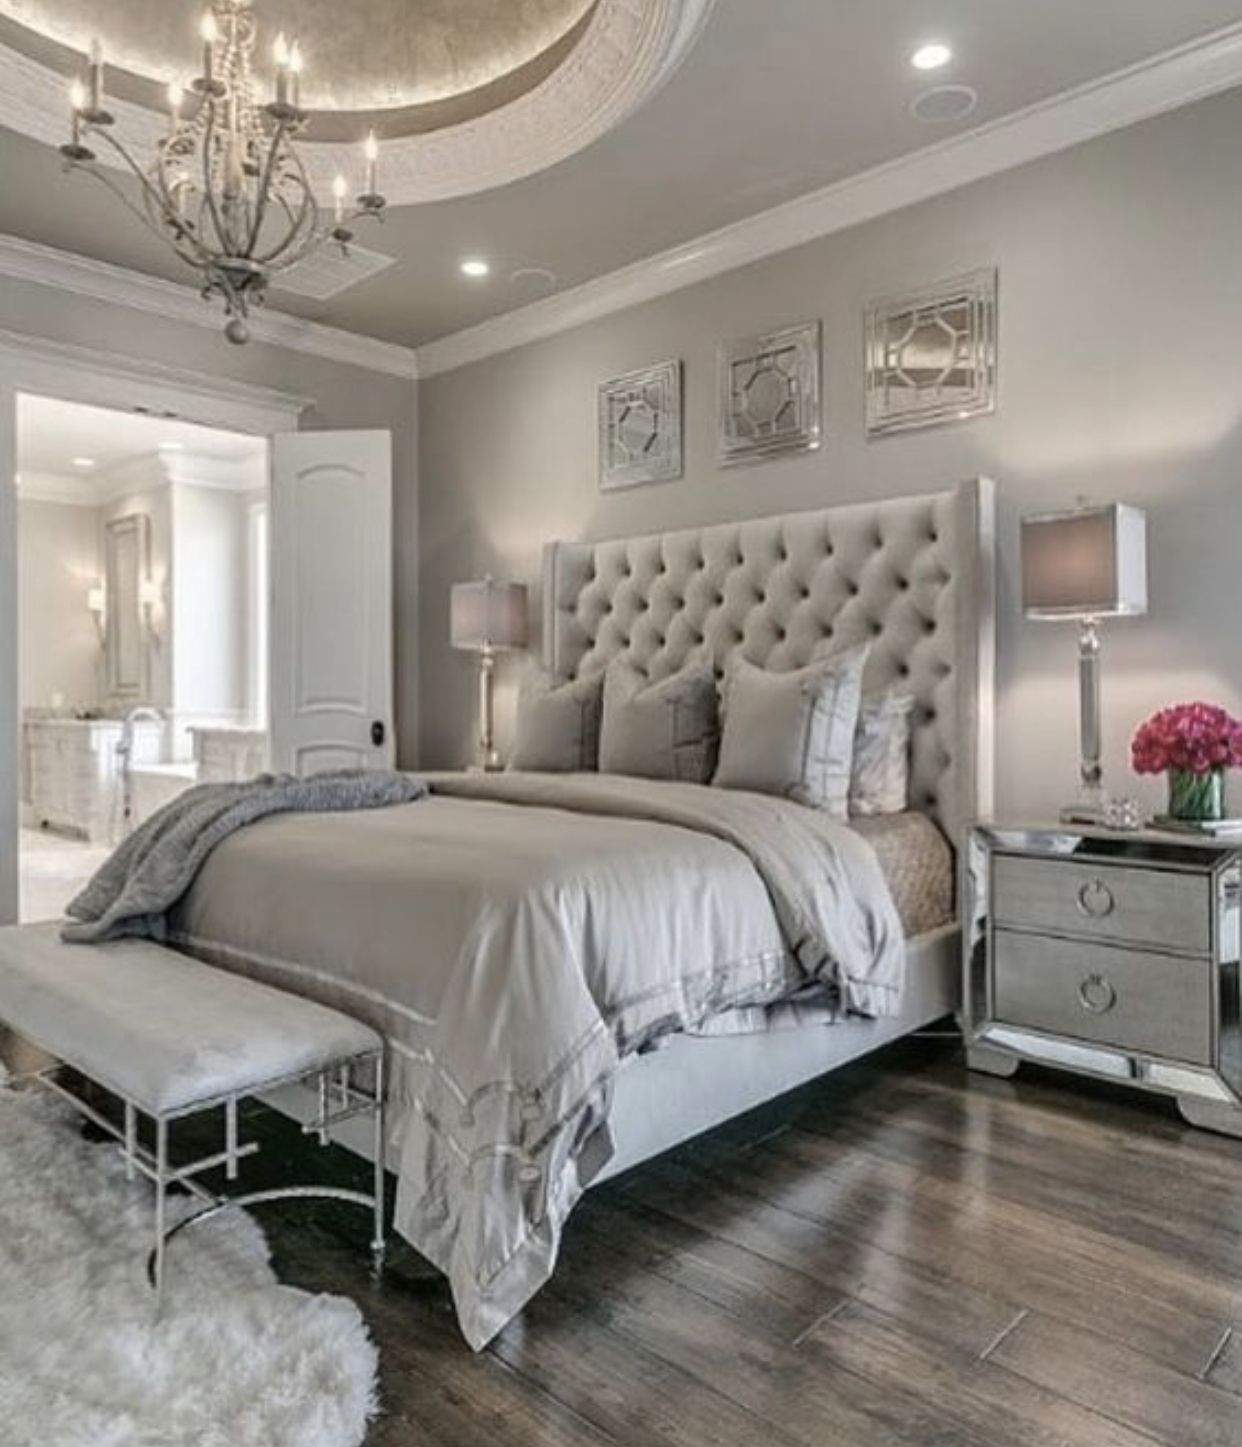 #modernrusticbedroom